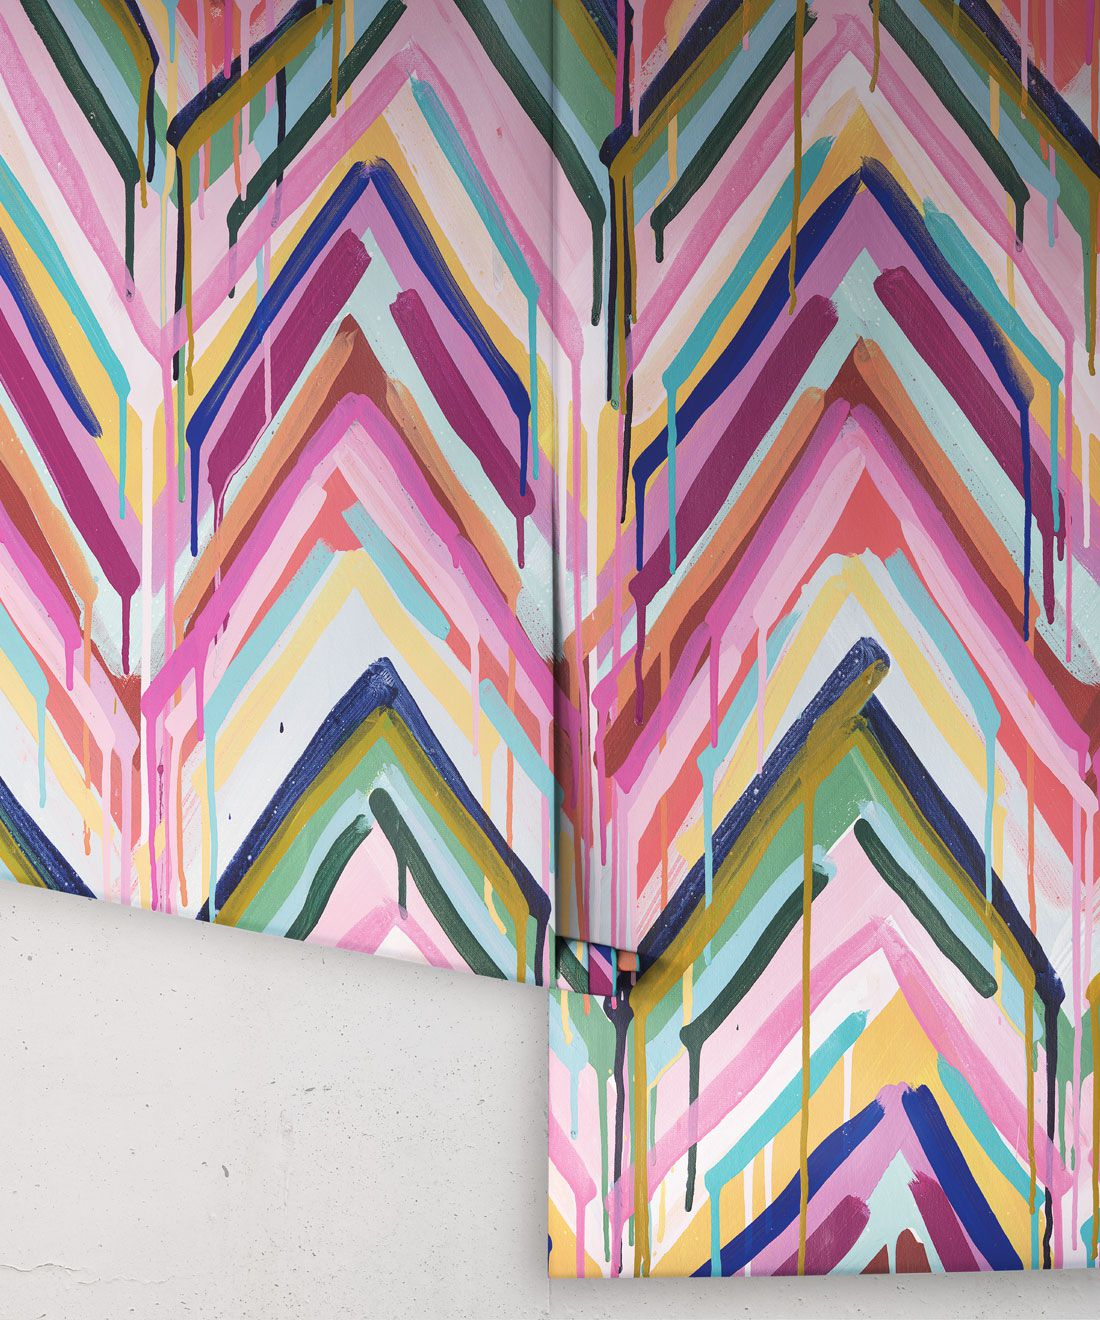 Crossroads Wallpaper •Colorful Painterly Wallpaper • Tiff Manuell • Chevron Wallpaper • Rolls